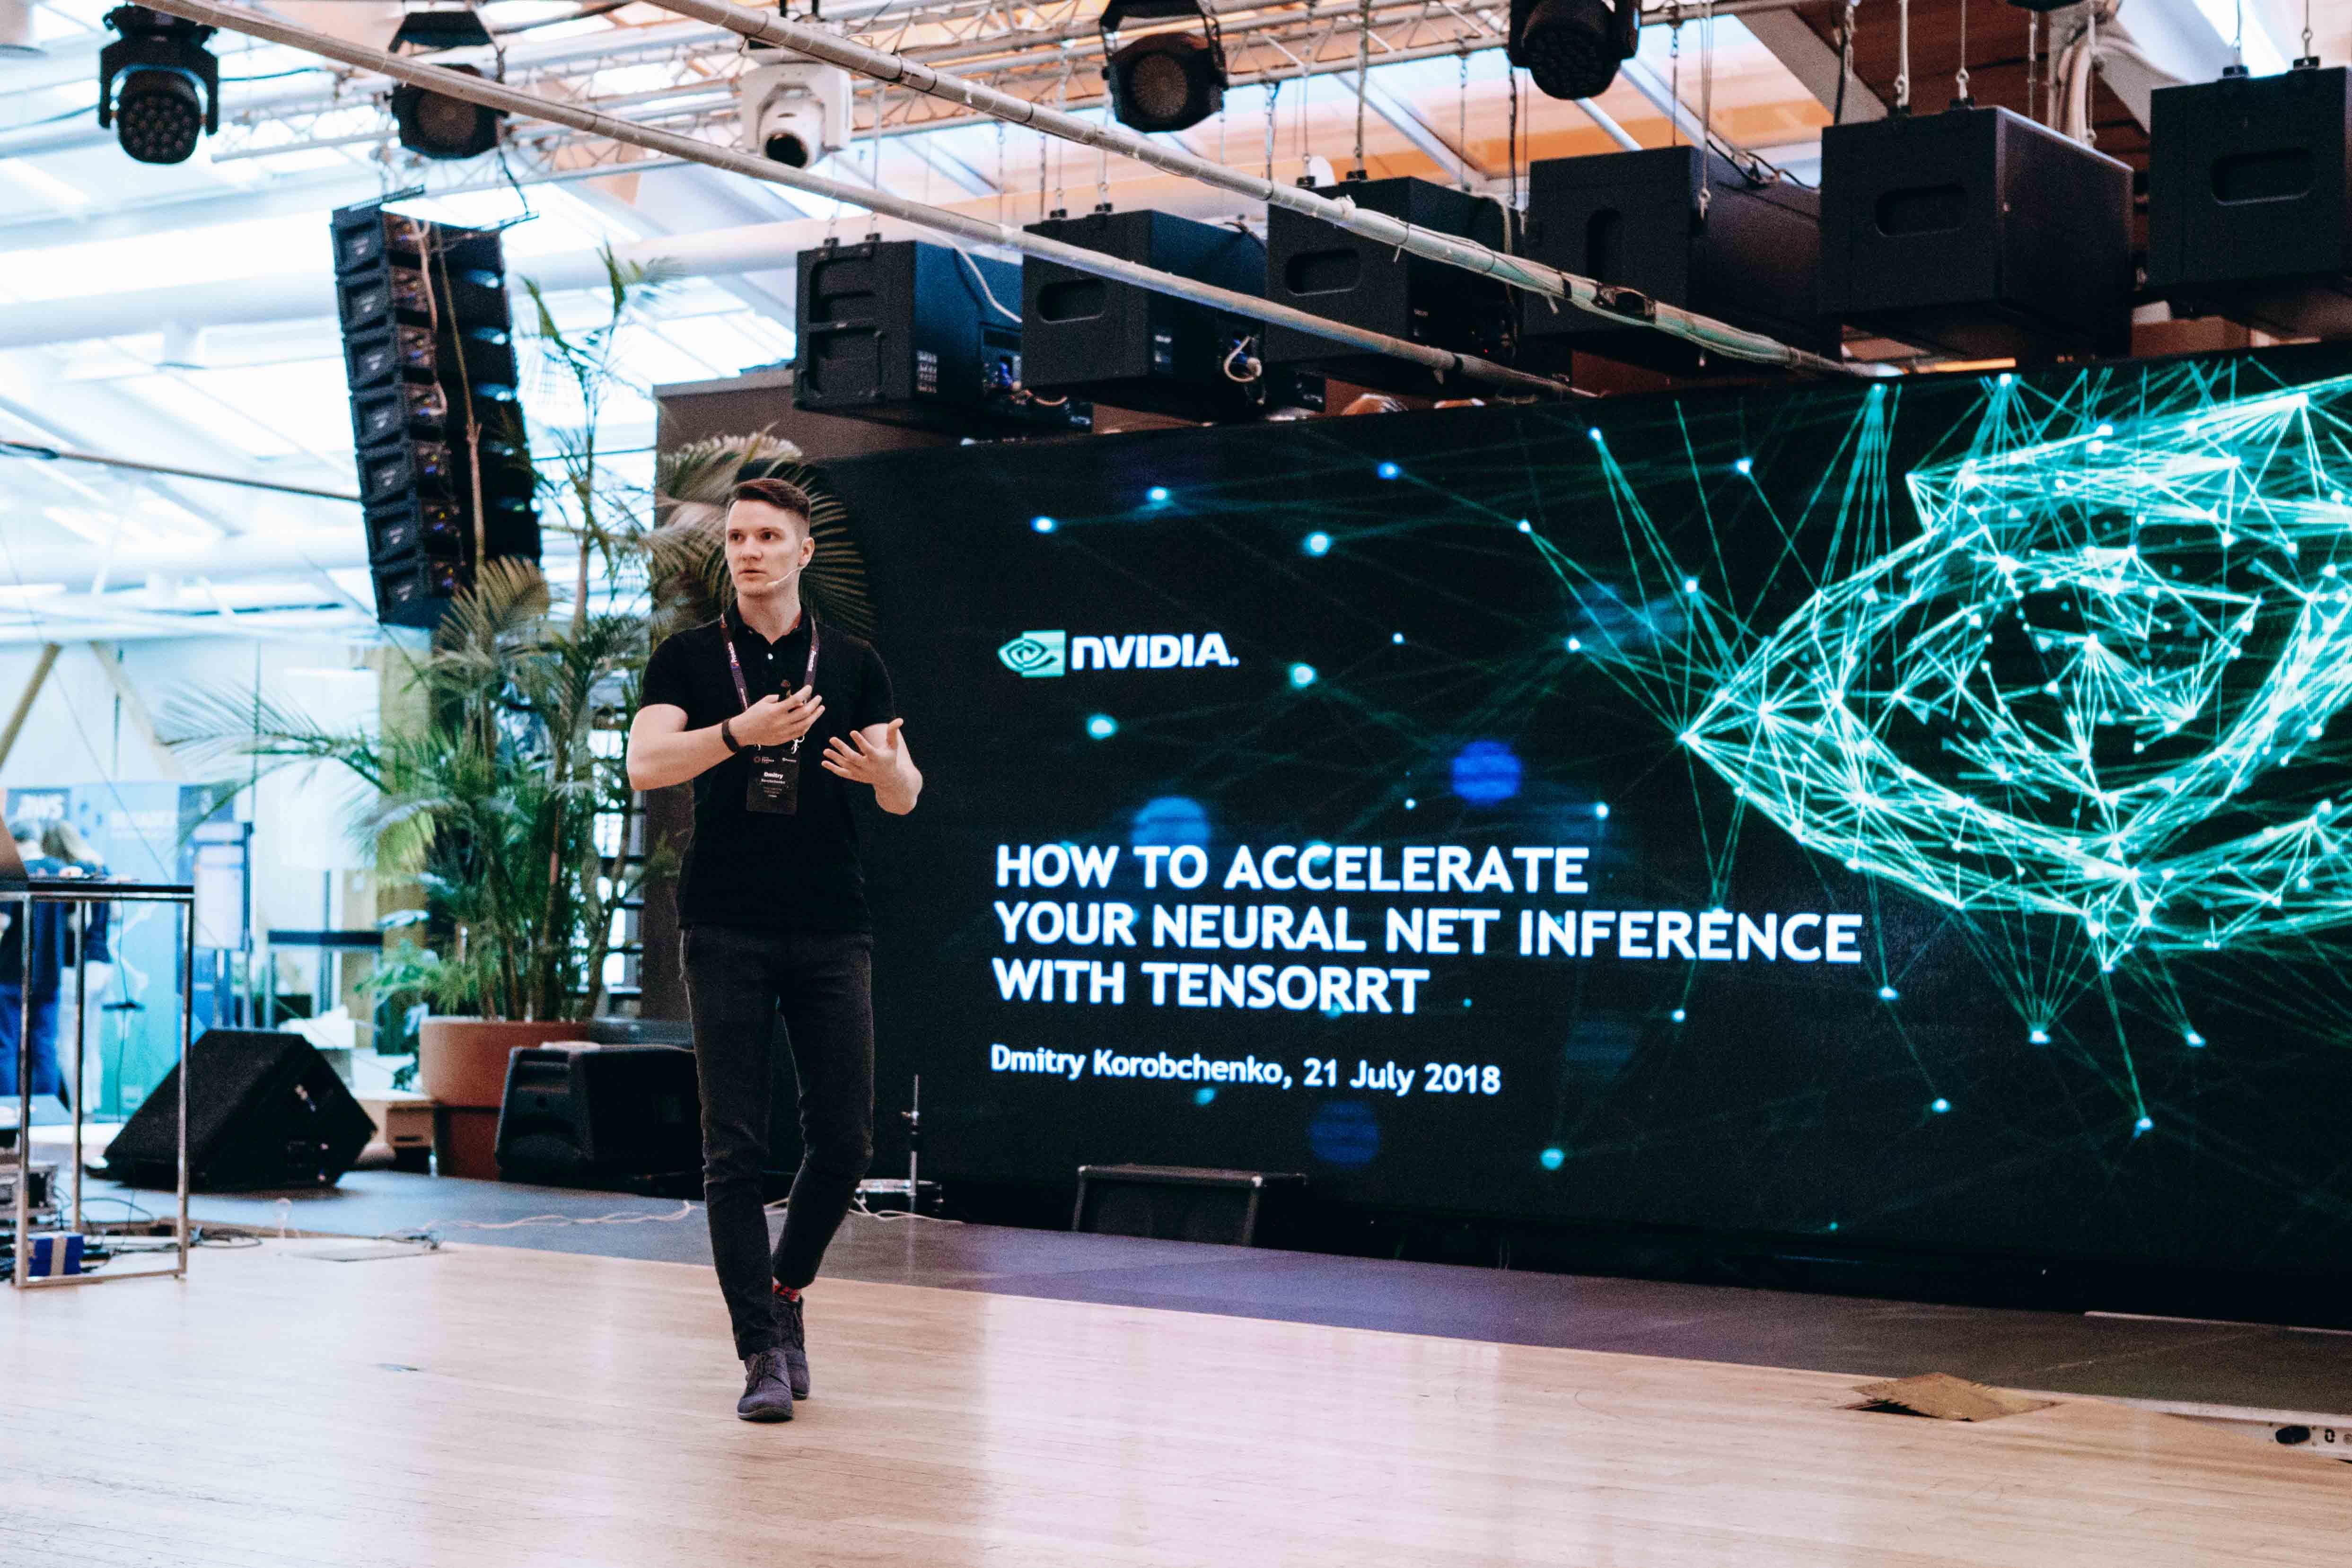 Nvidia speaker at Data Summer conf